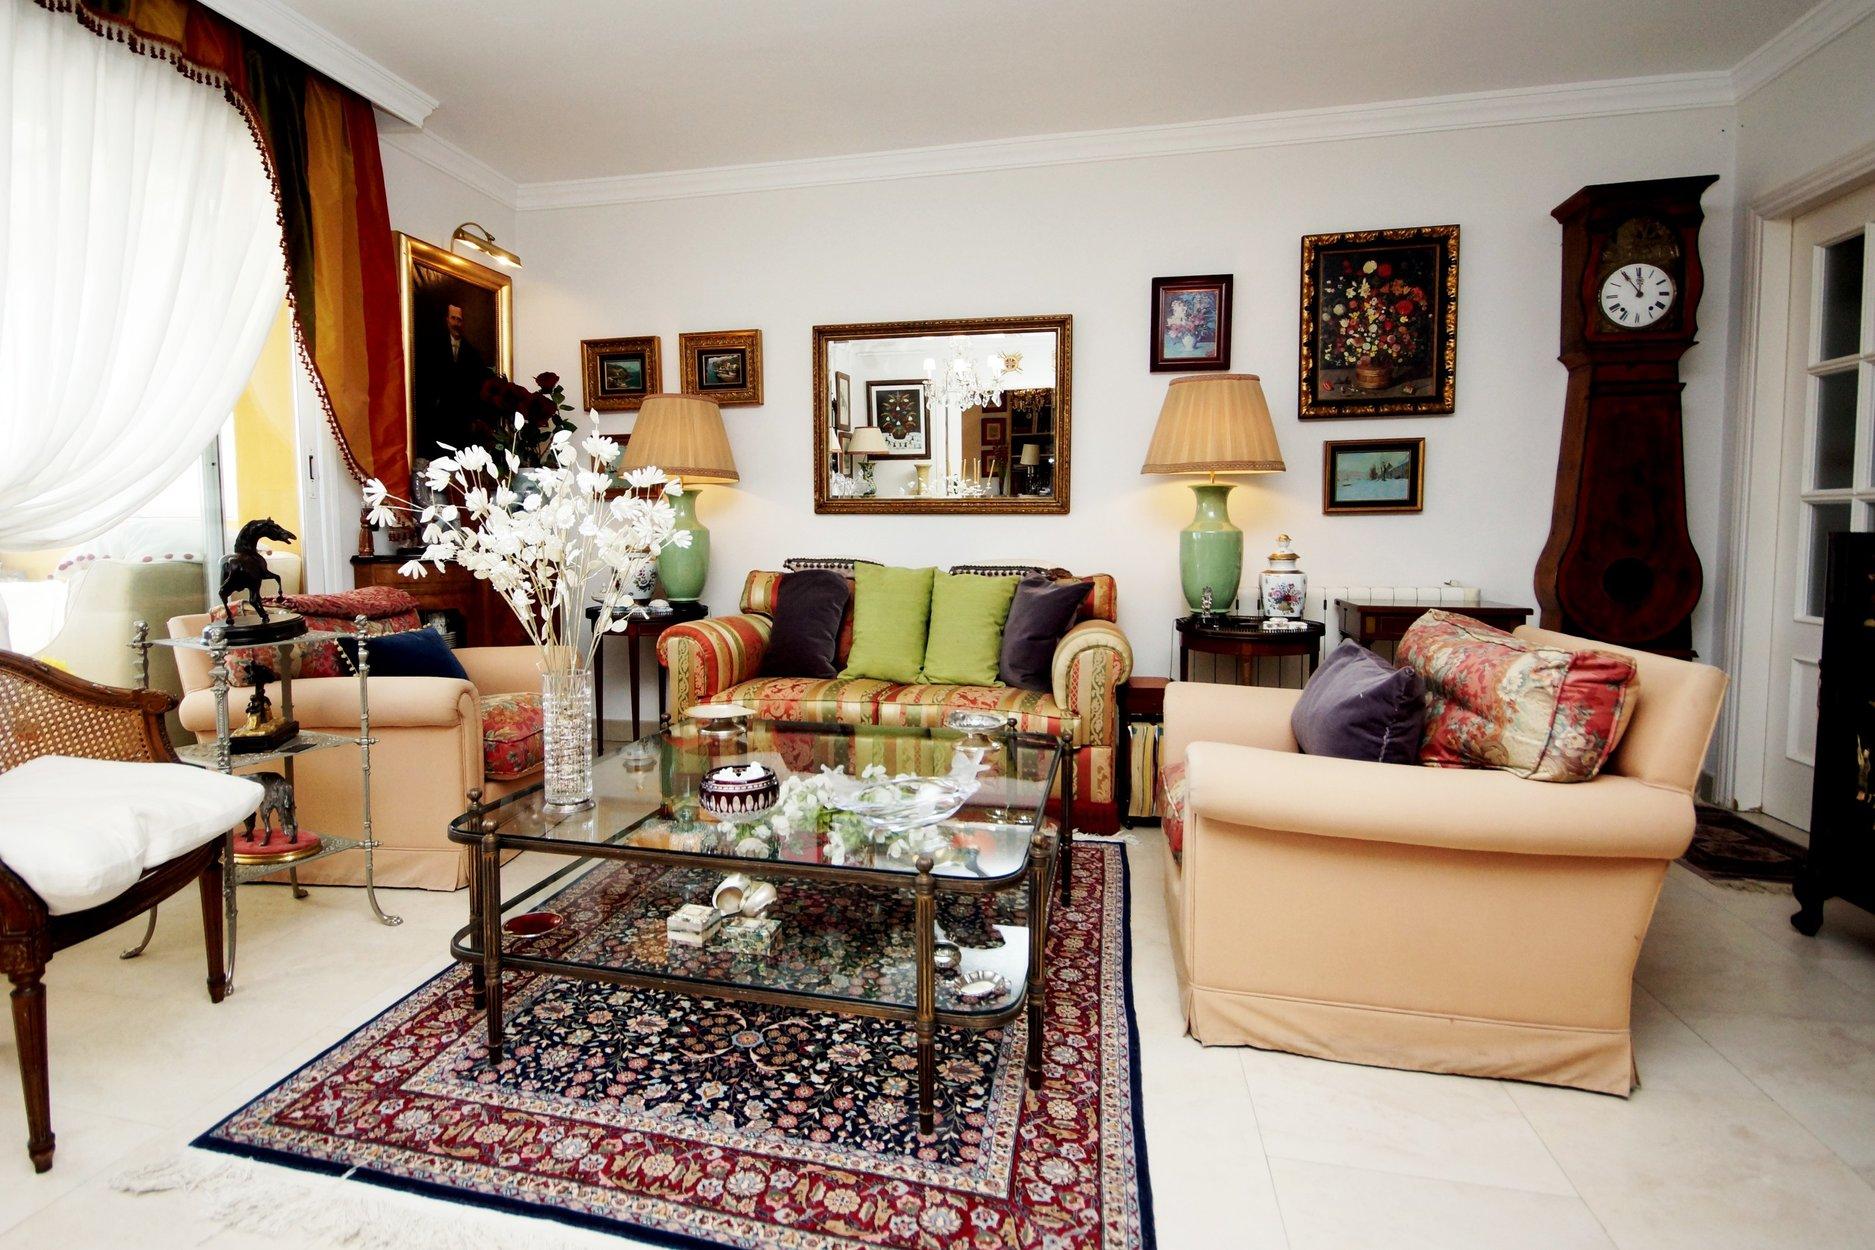 3 Bedroom 2 Bathroom Penthouse For Sale In El Infantado Marbella Golden Mile